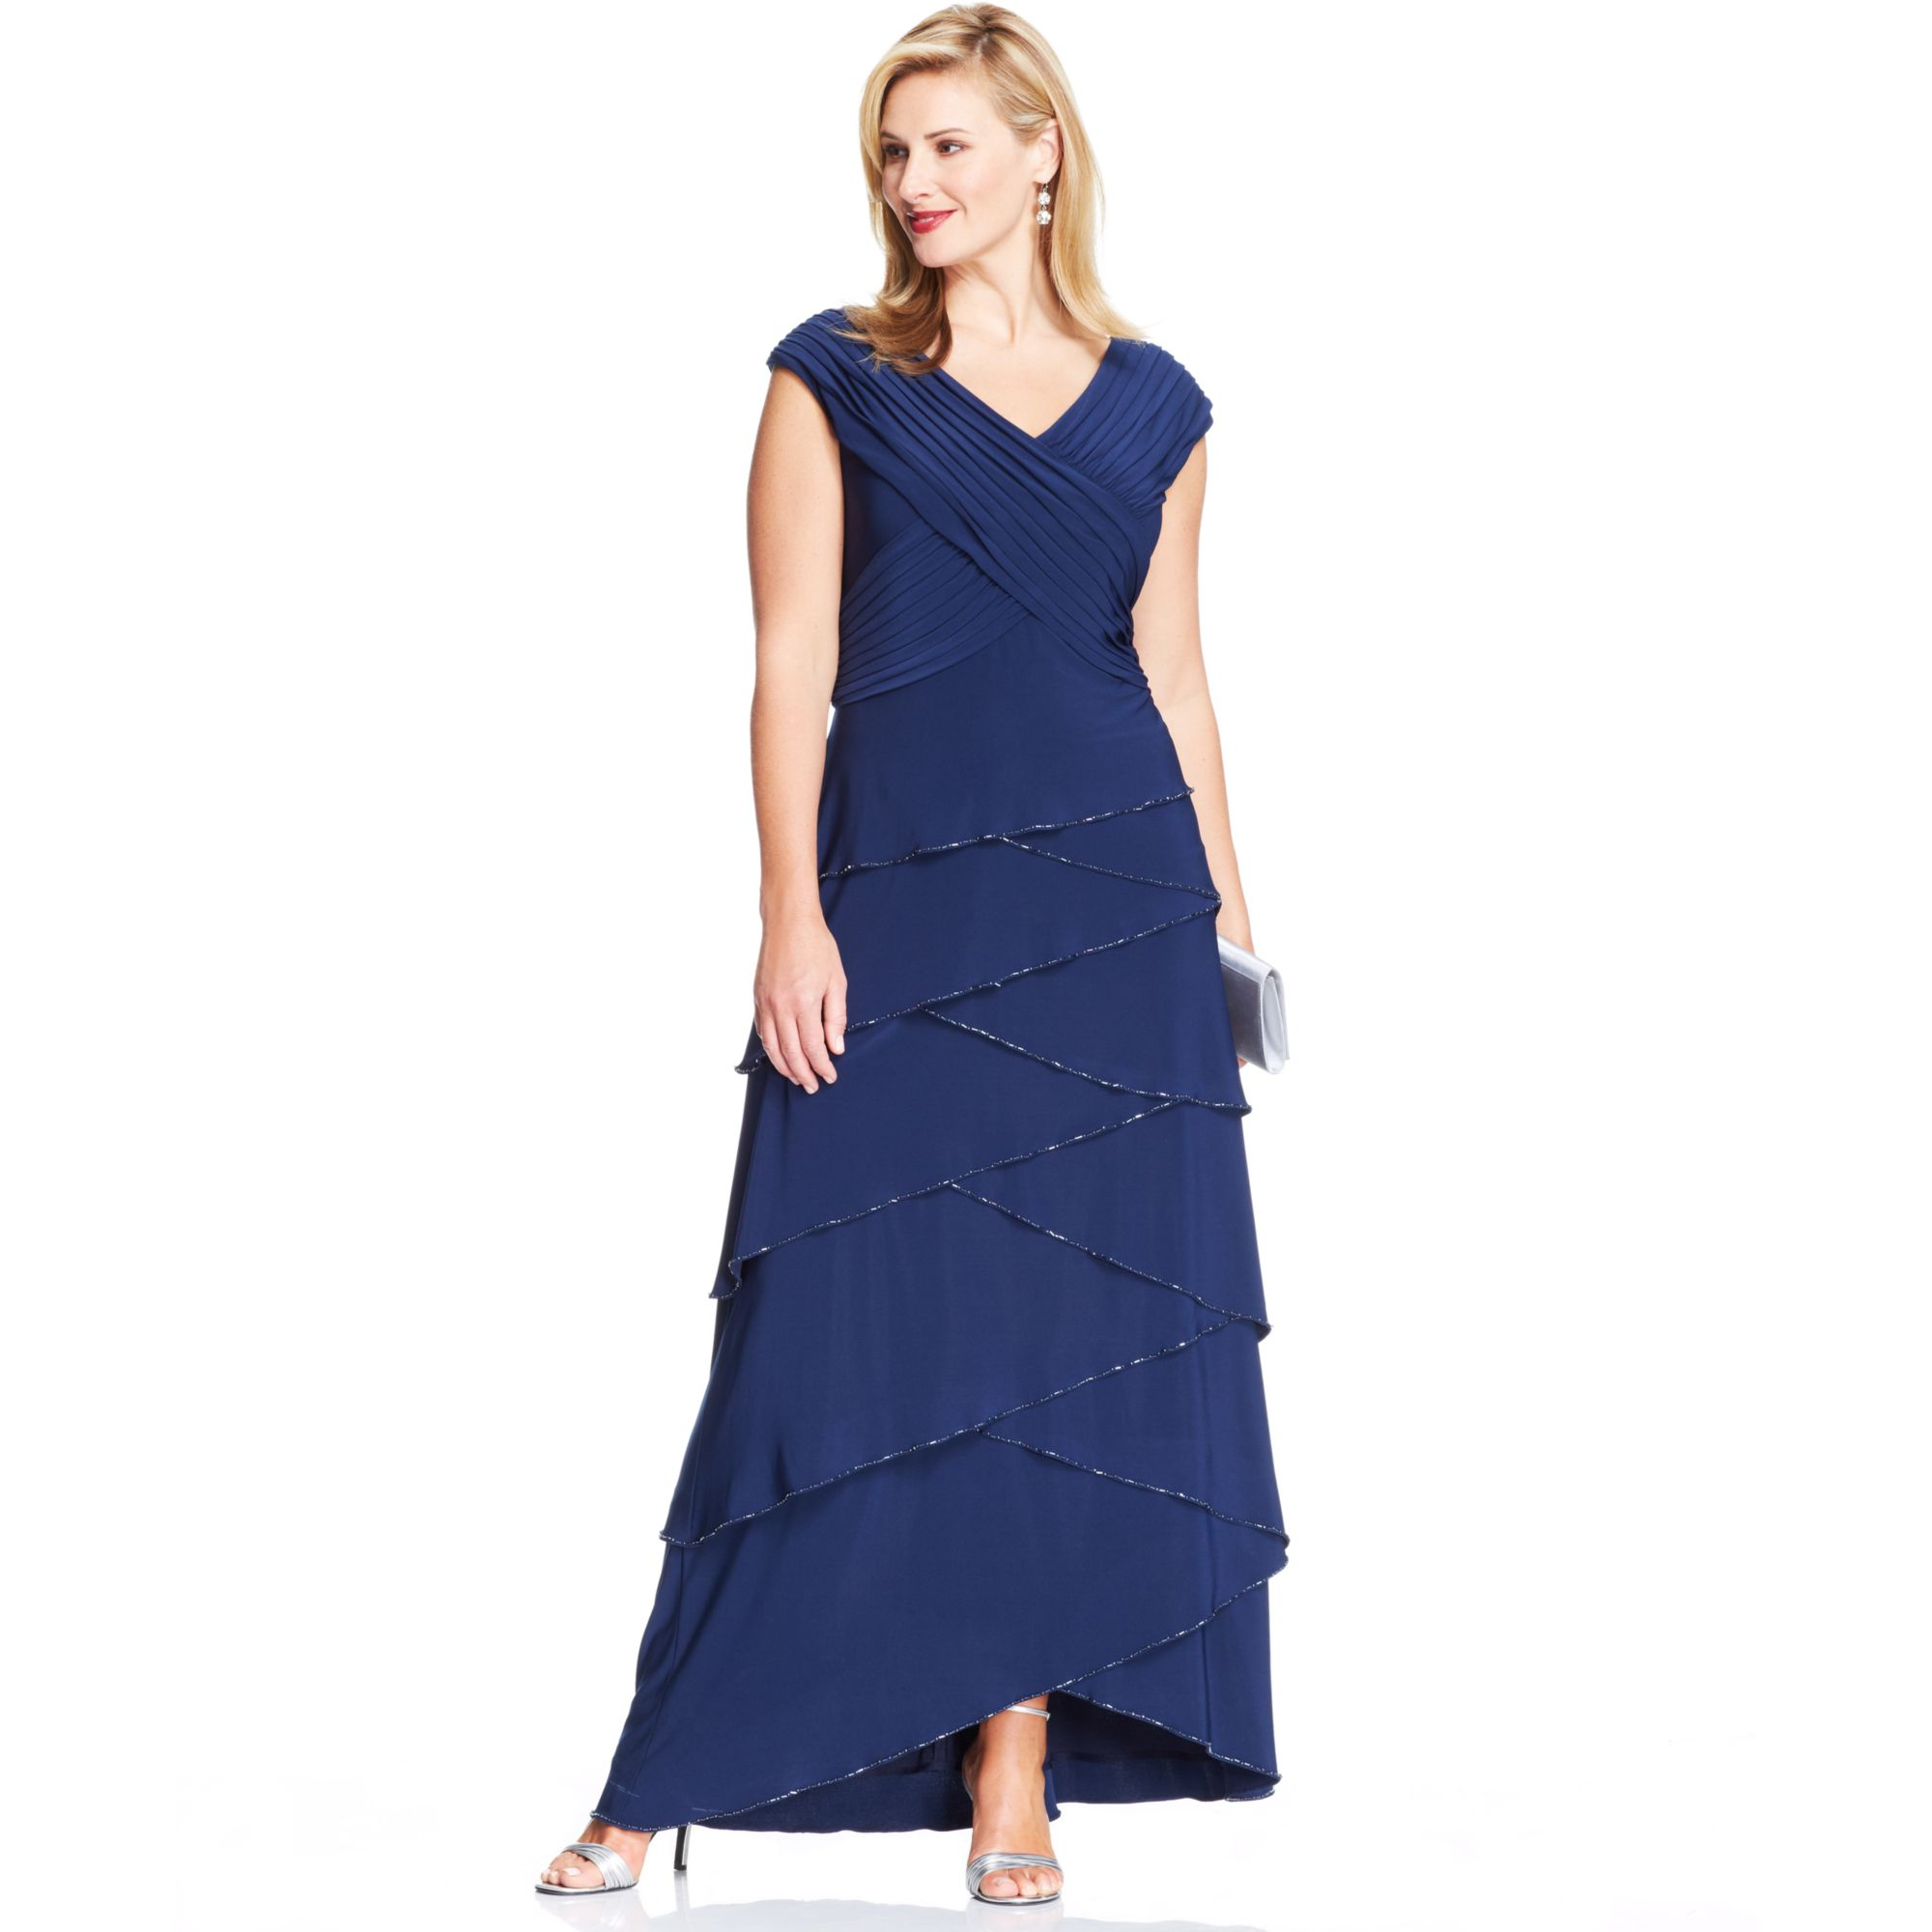 Patra Silk Plus Size Dresses 31